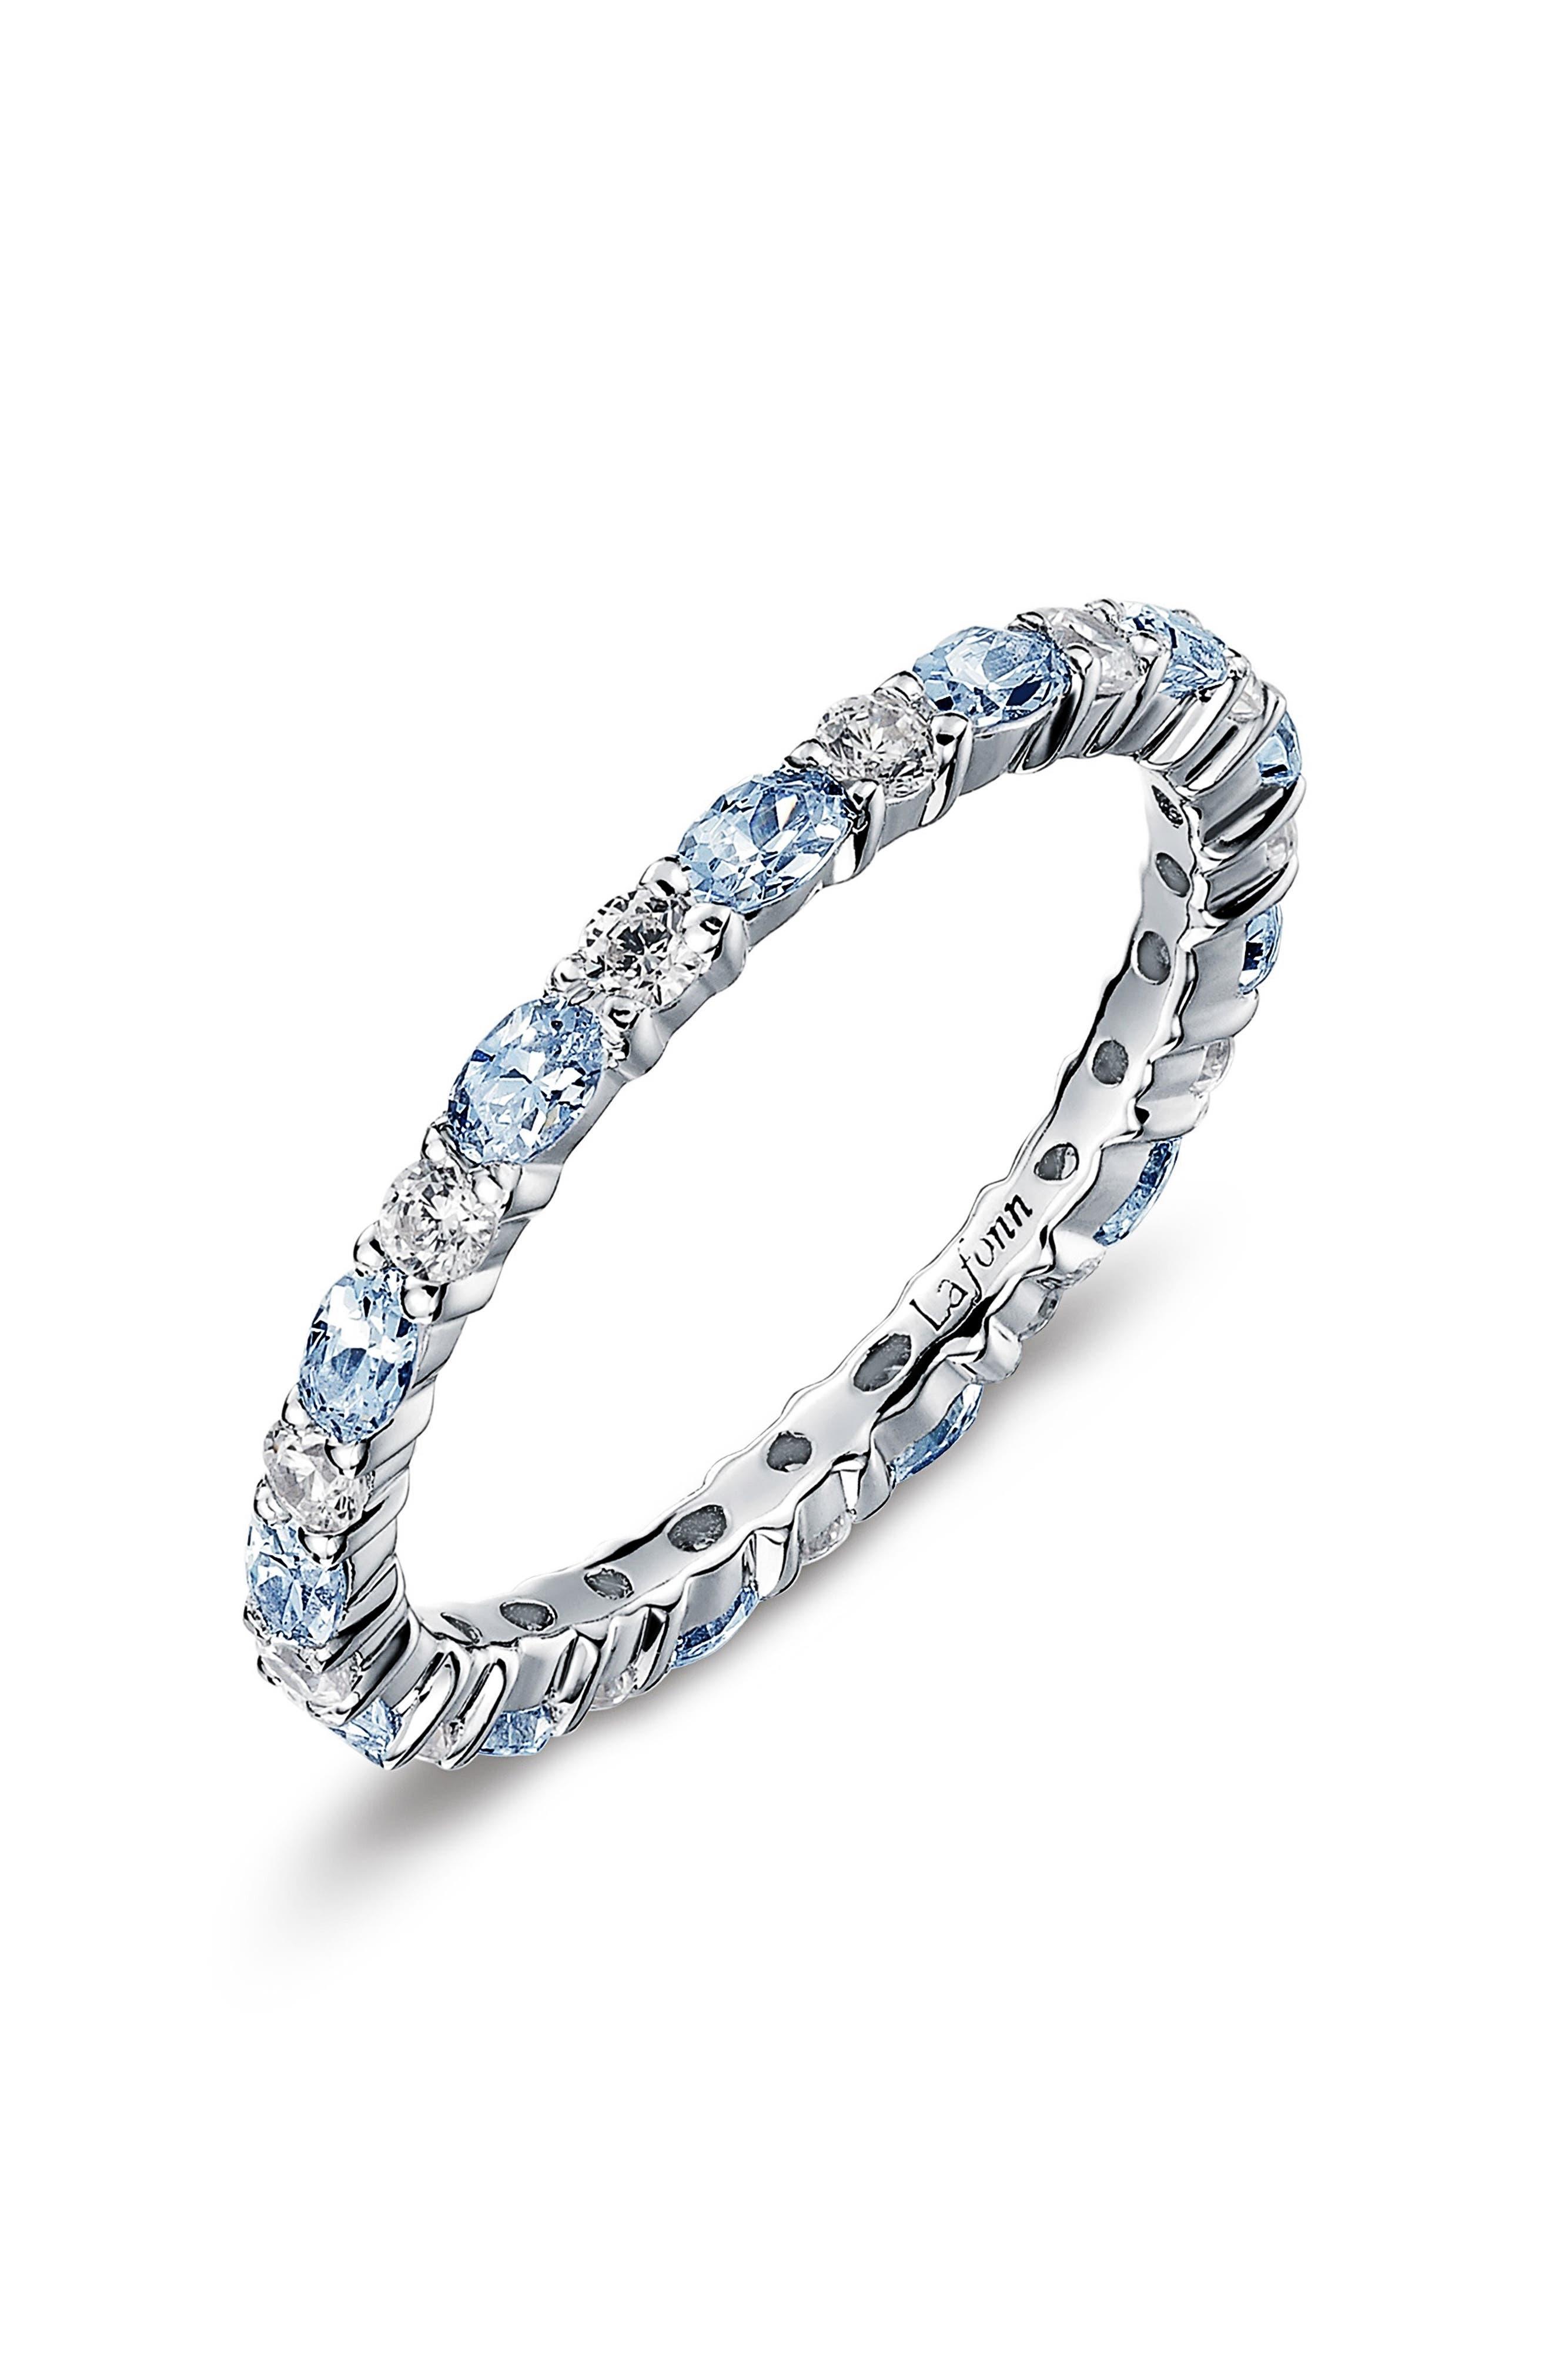 Lafonn Simulated Diamond Birthstone Band Ring